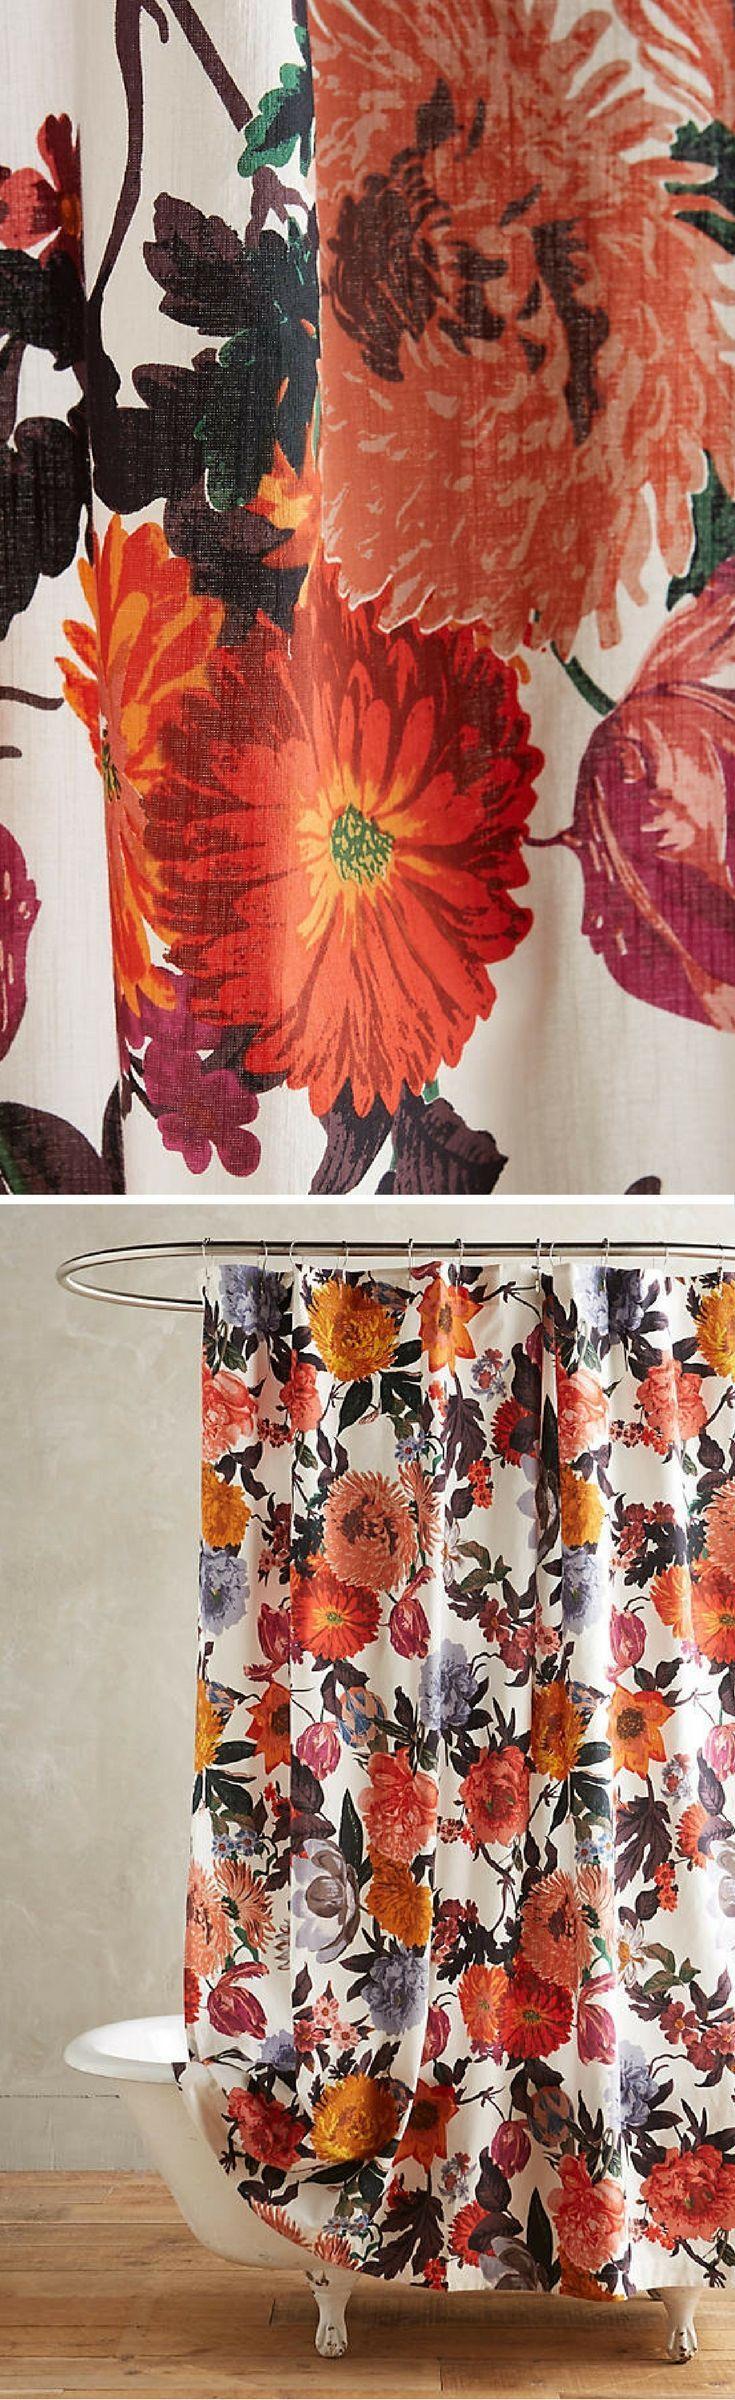 orange floral shower curtain. Floral Shower Curtain  Retro Bathroom Decor Ad homedecor bathroom Best 25 shower curtains ideas on Pinterest Bohemian